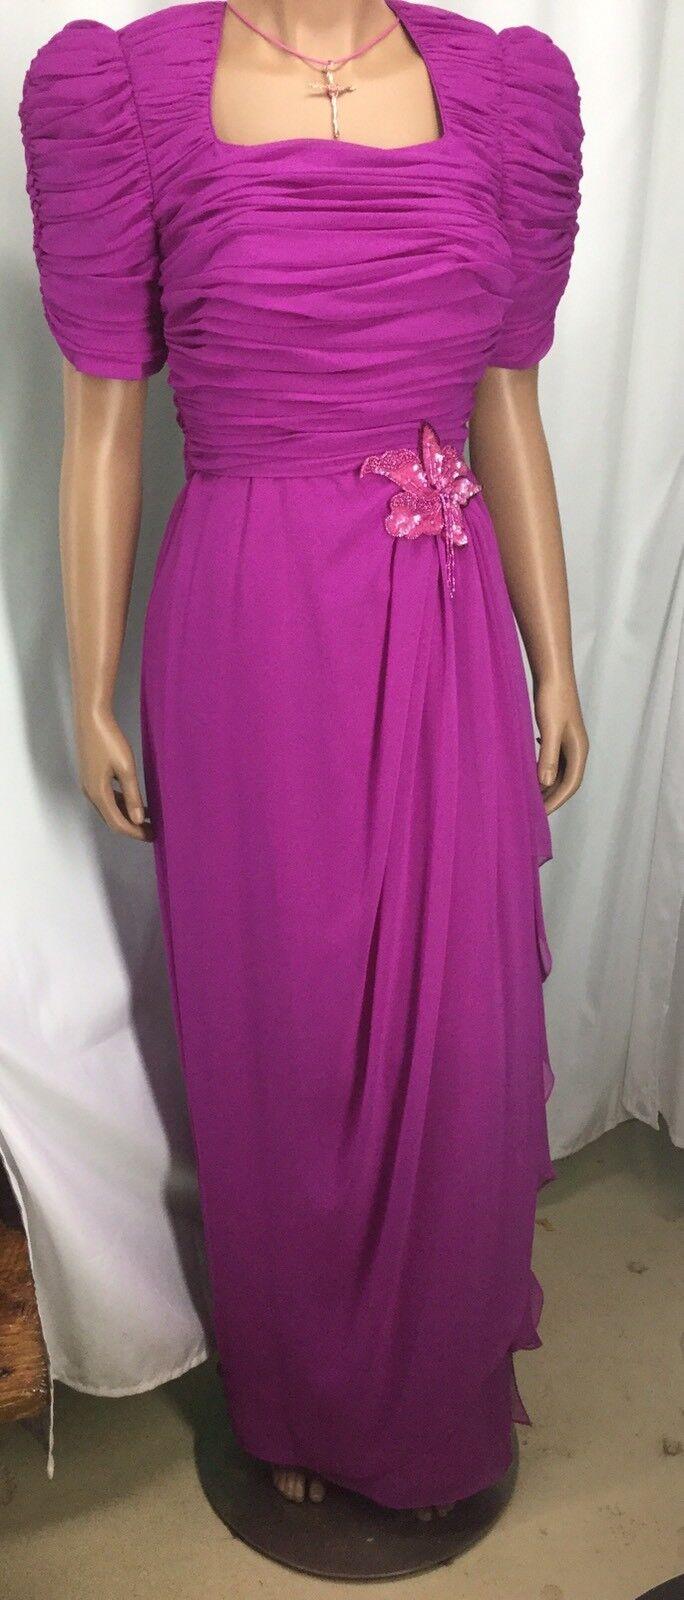 Miss Elliette Fushia Pink Long Formal Dress Womens Size 4 NWT 171008MFC DHB